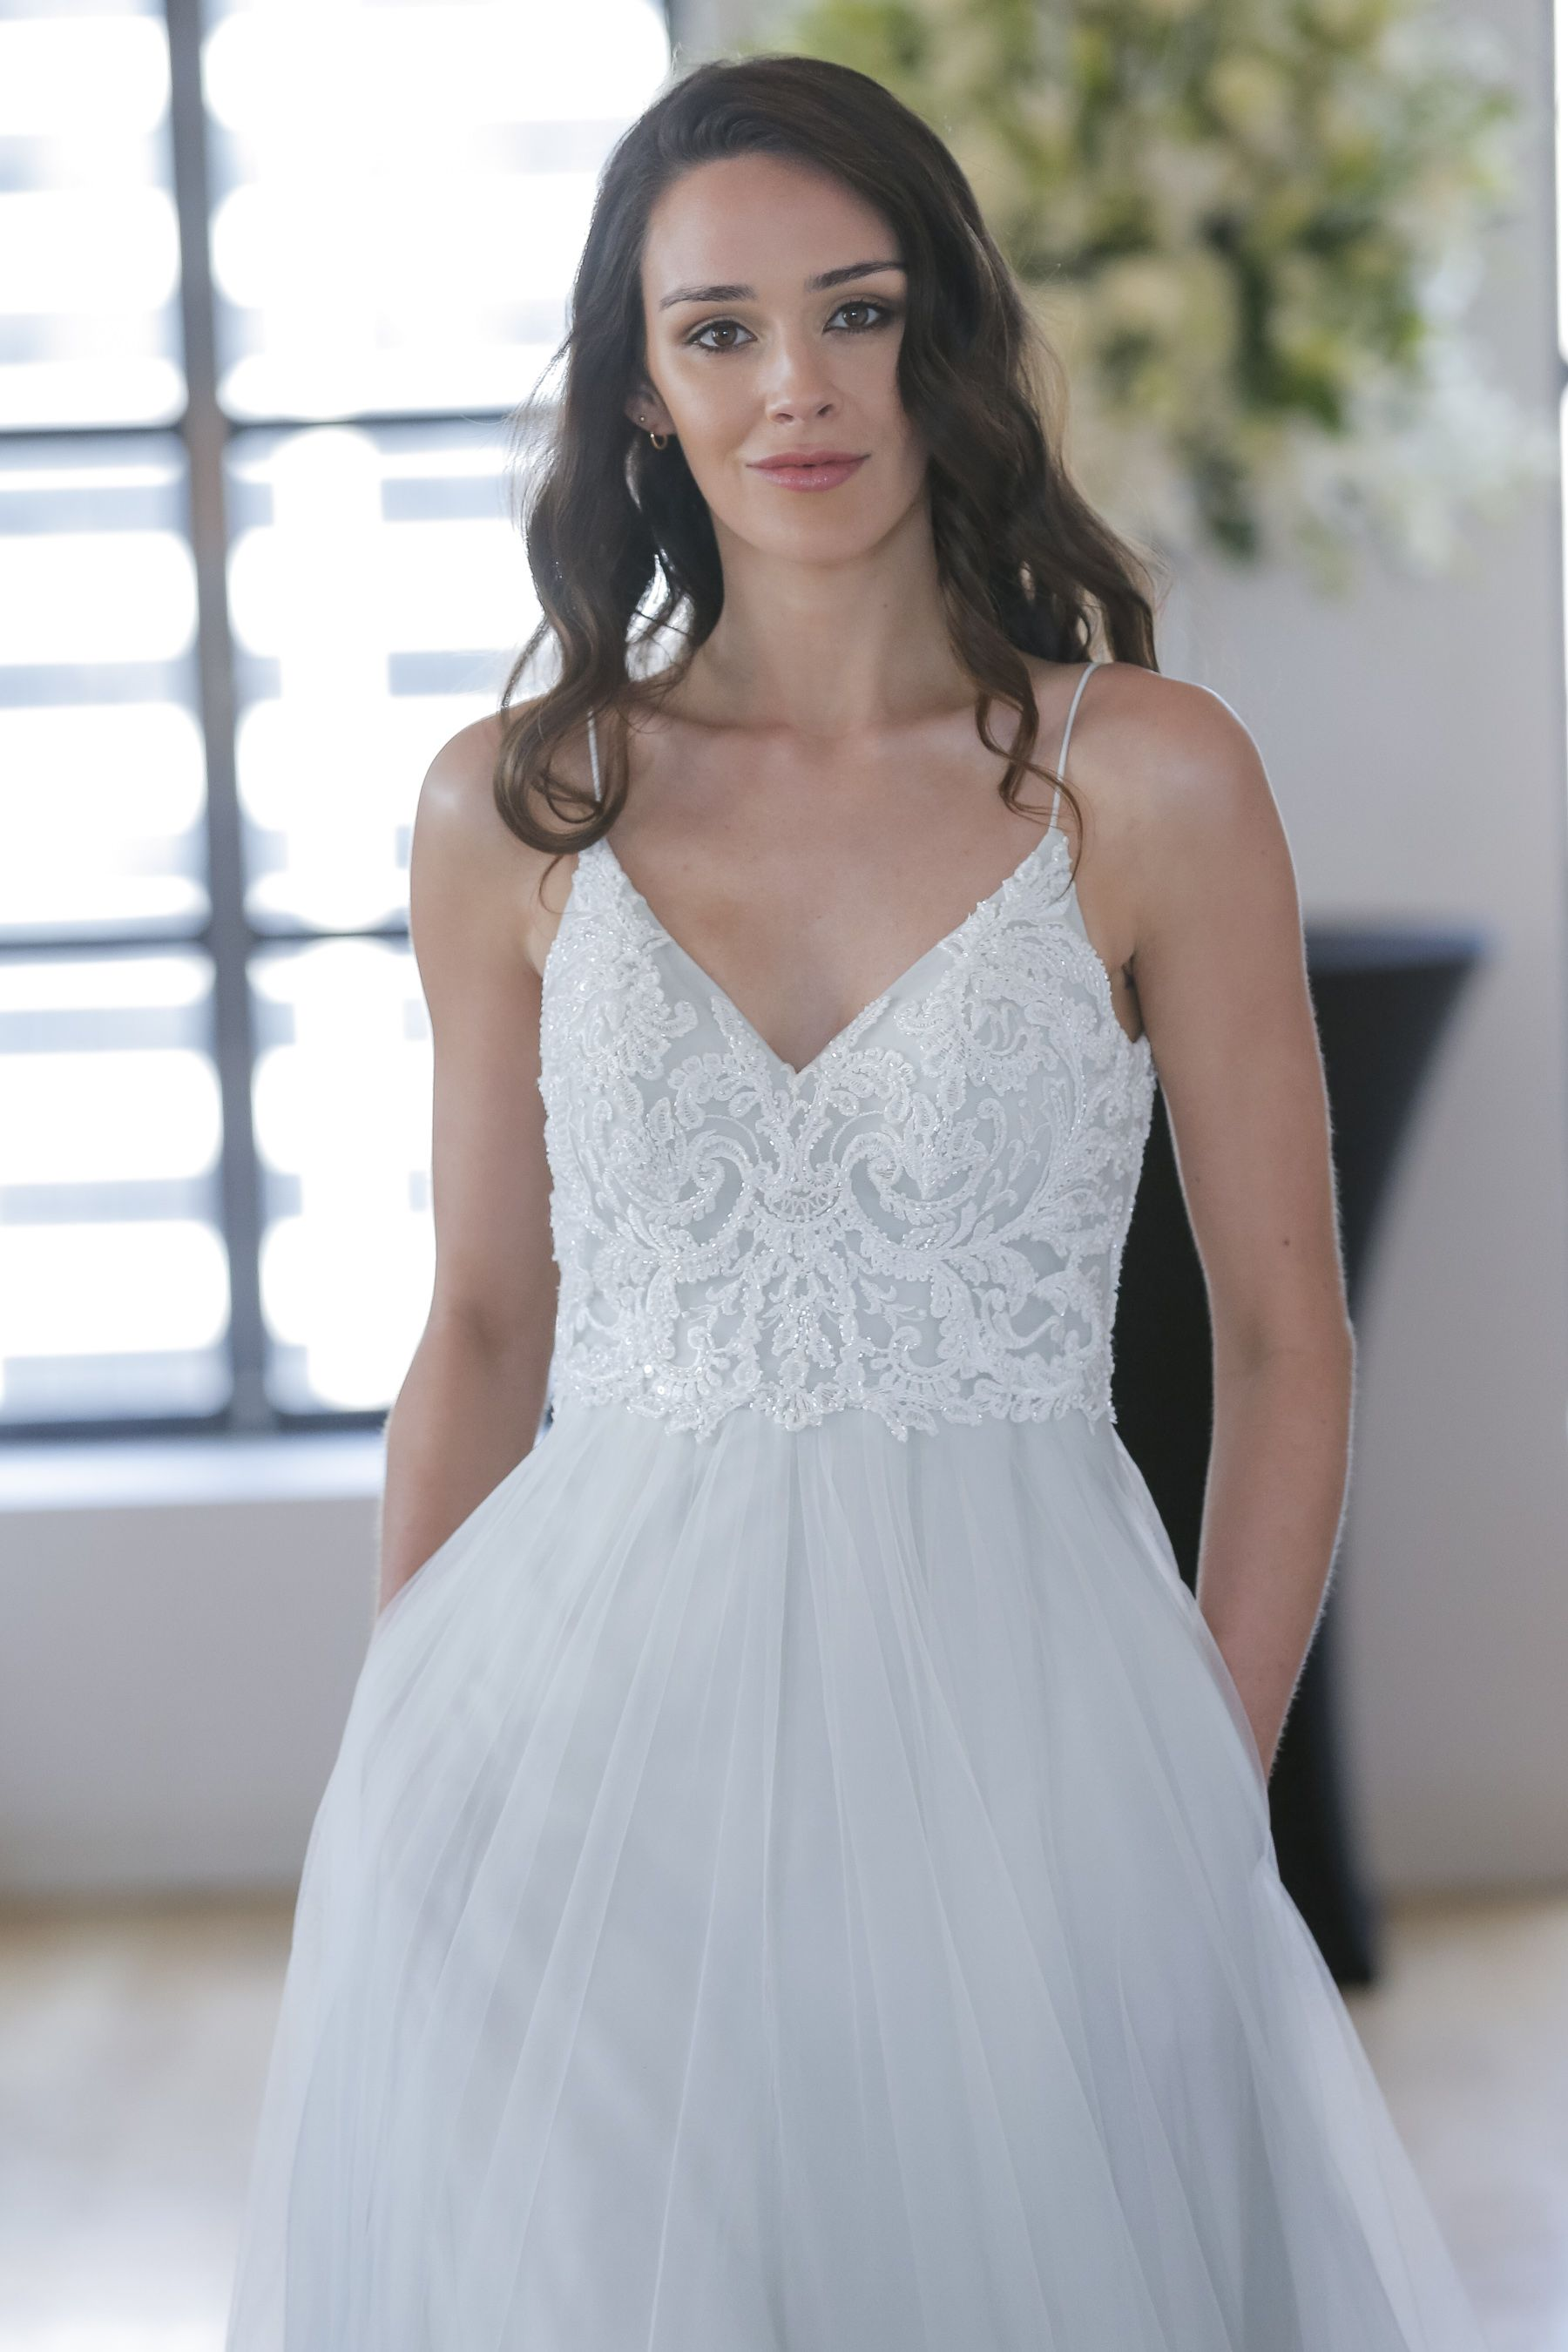 STAR Kelly Faetanini Fall 2018 wedding dress | Pearlescent ...